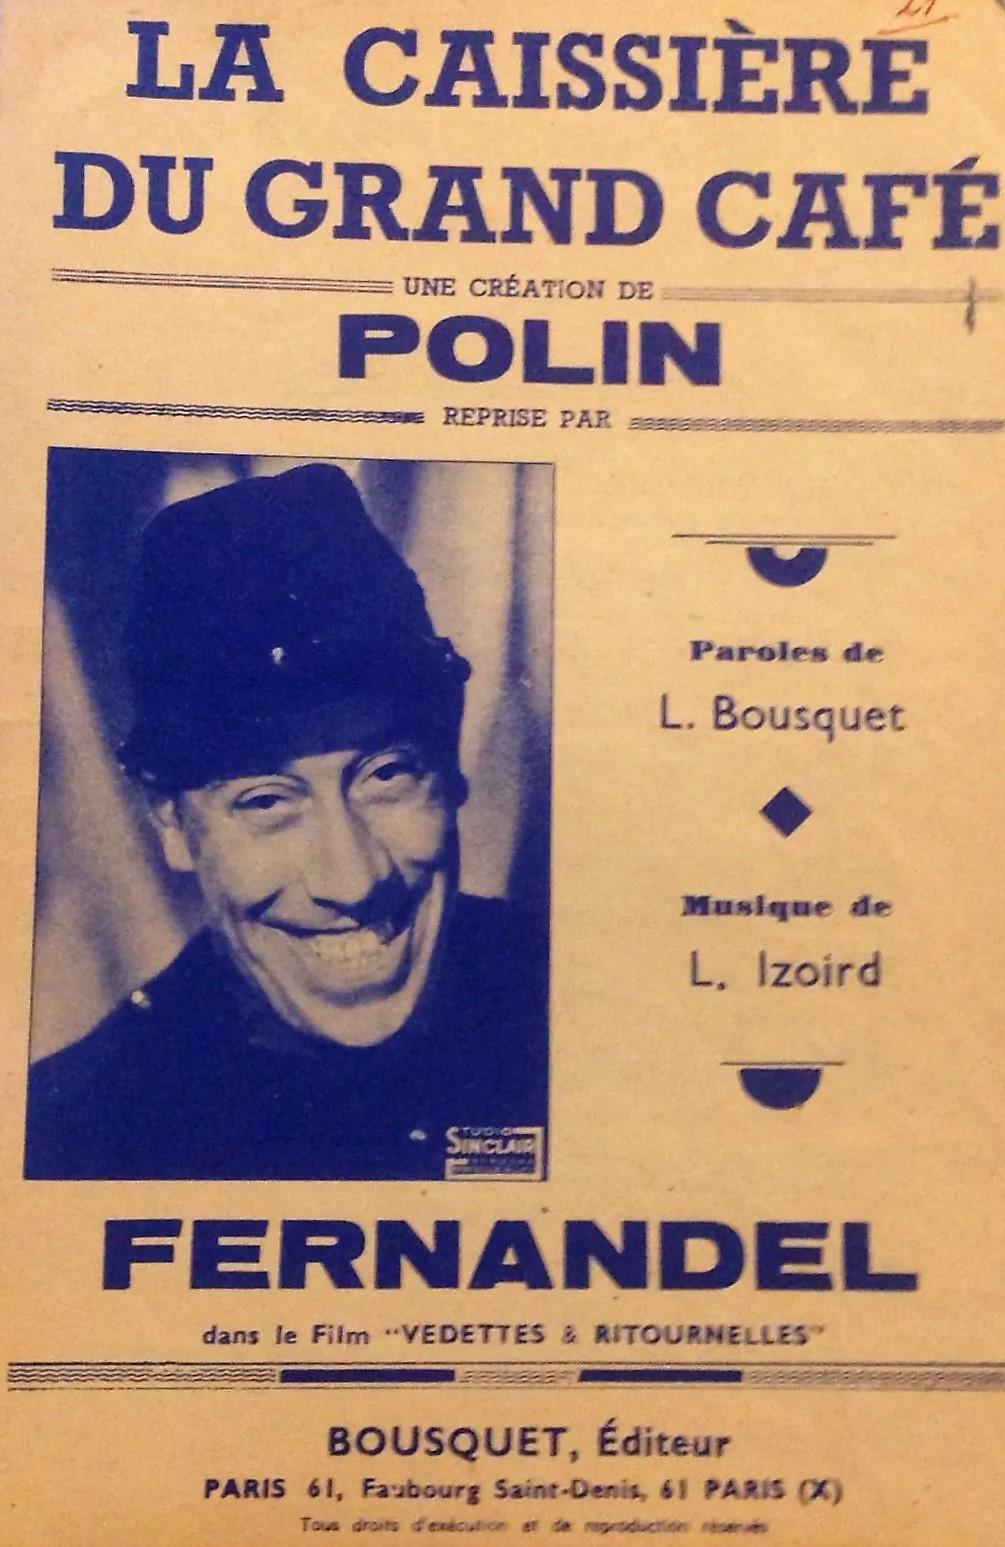 http://t.avery.free.fr/Fernandel/Caiss.jpg